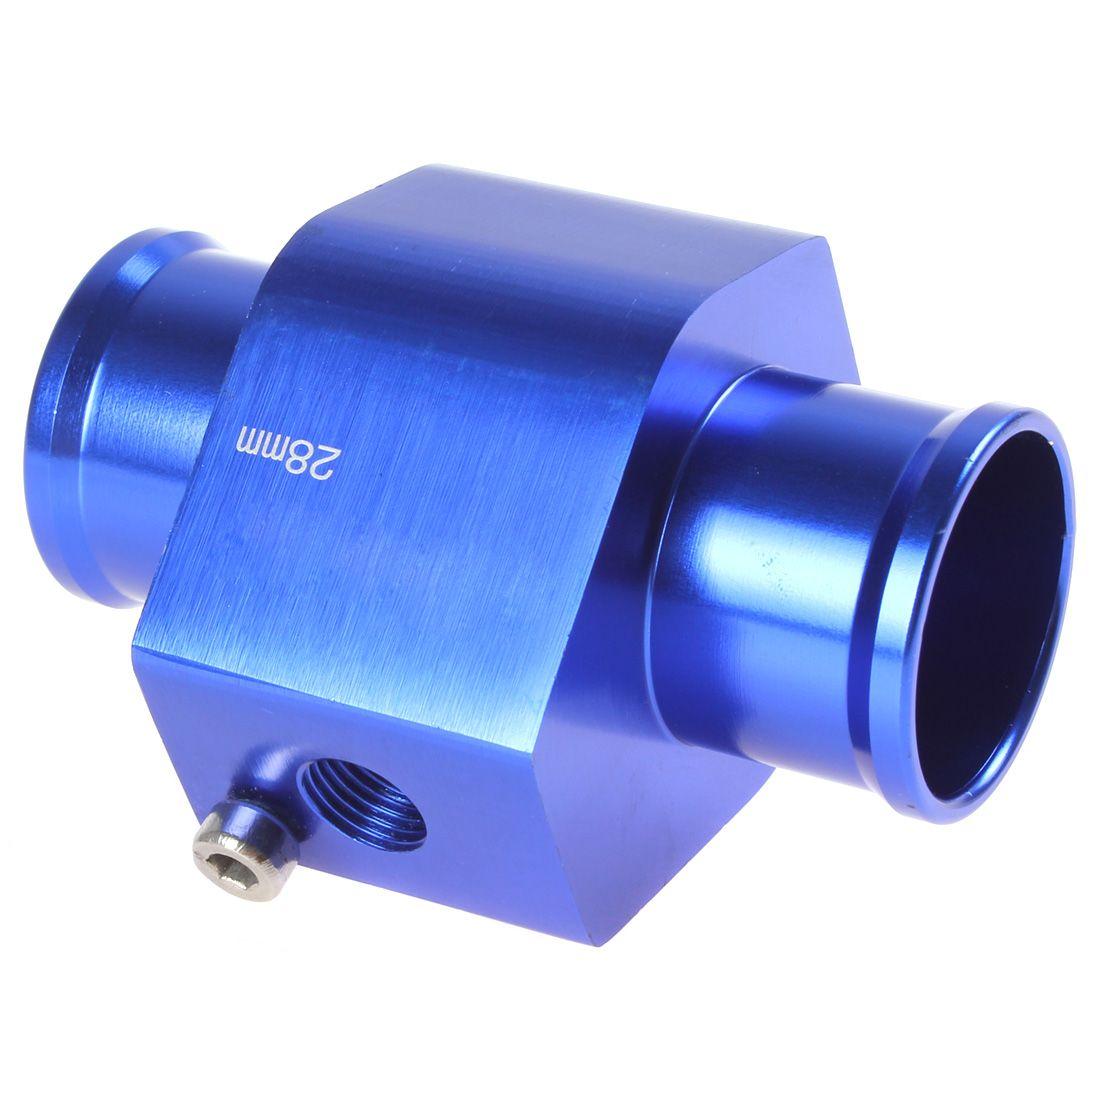 Adaptateur de jauge 28mm en aluminium avec pinces CEC_514